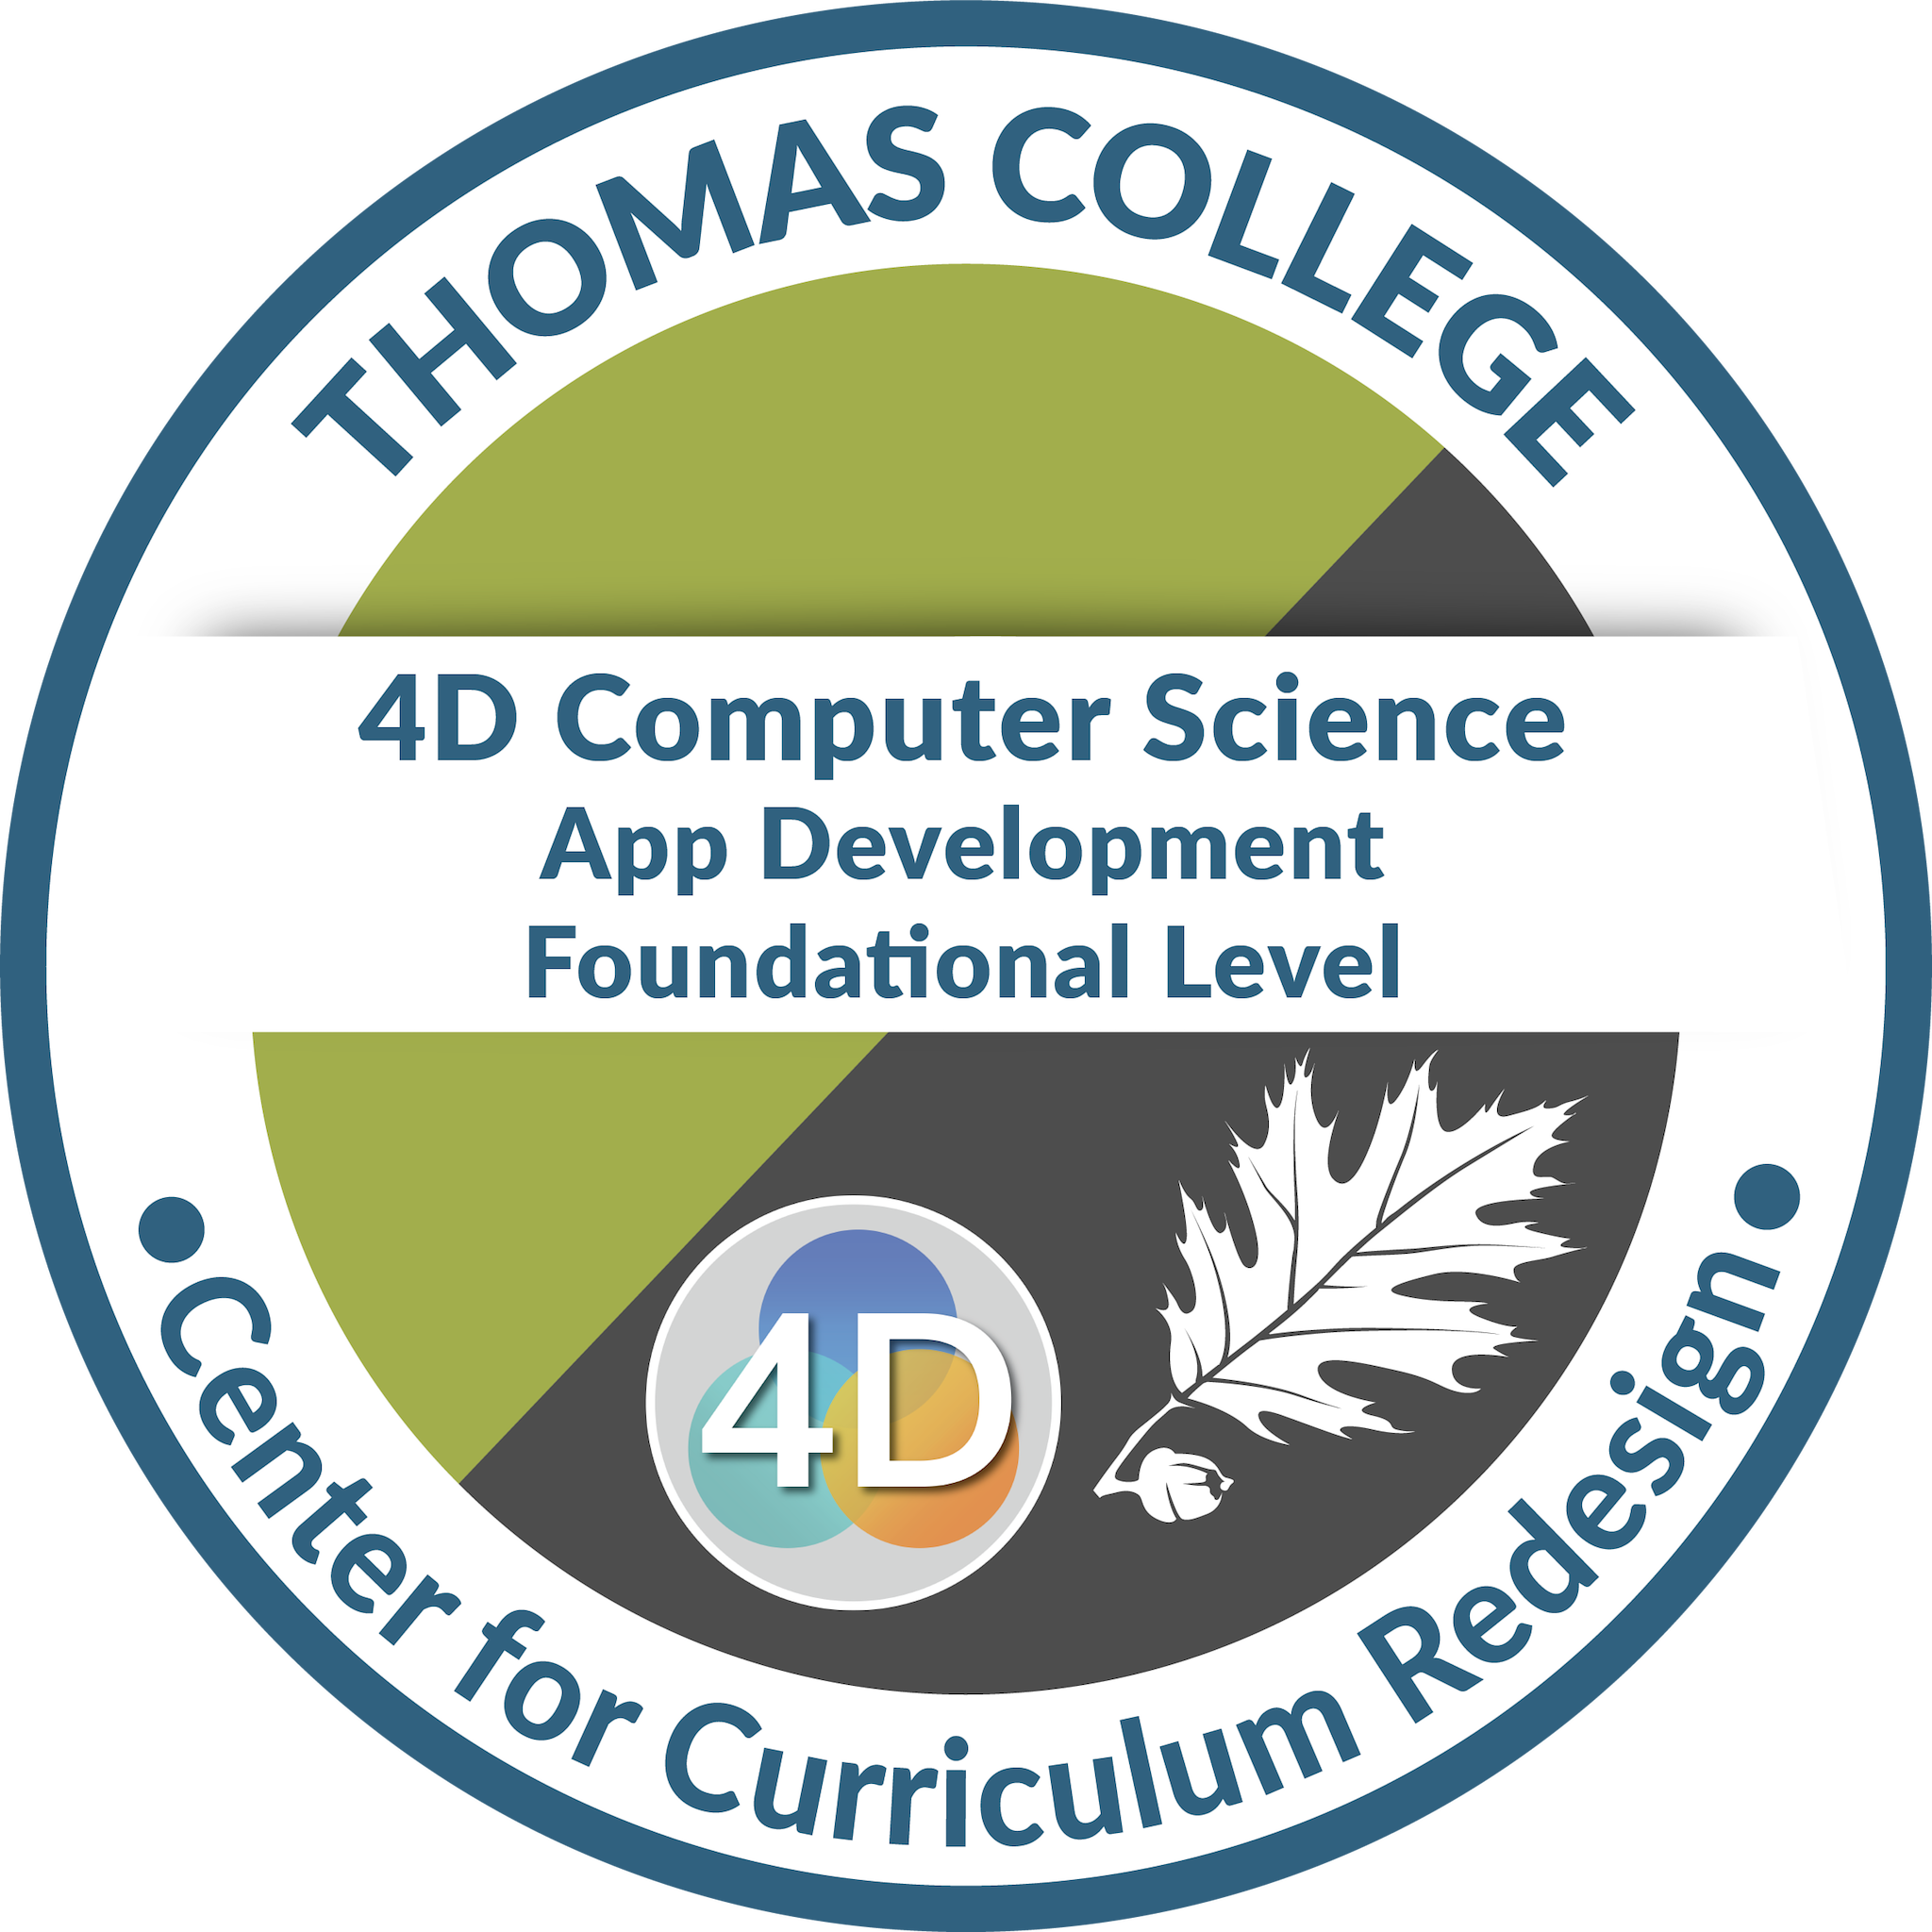 4D Computer Science: App Development